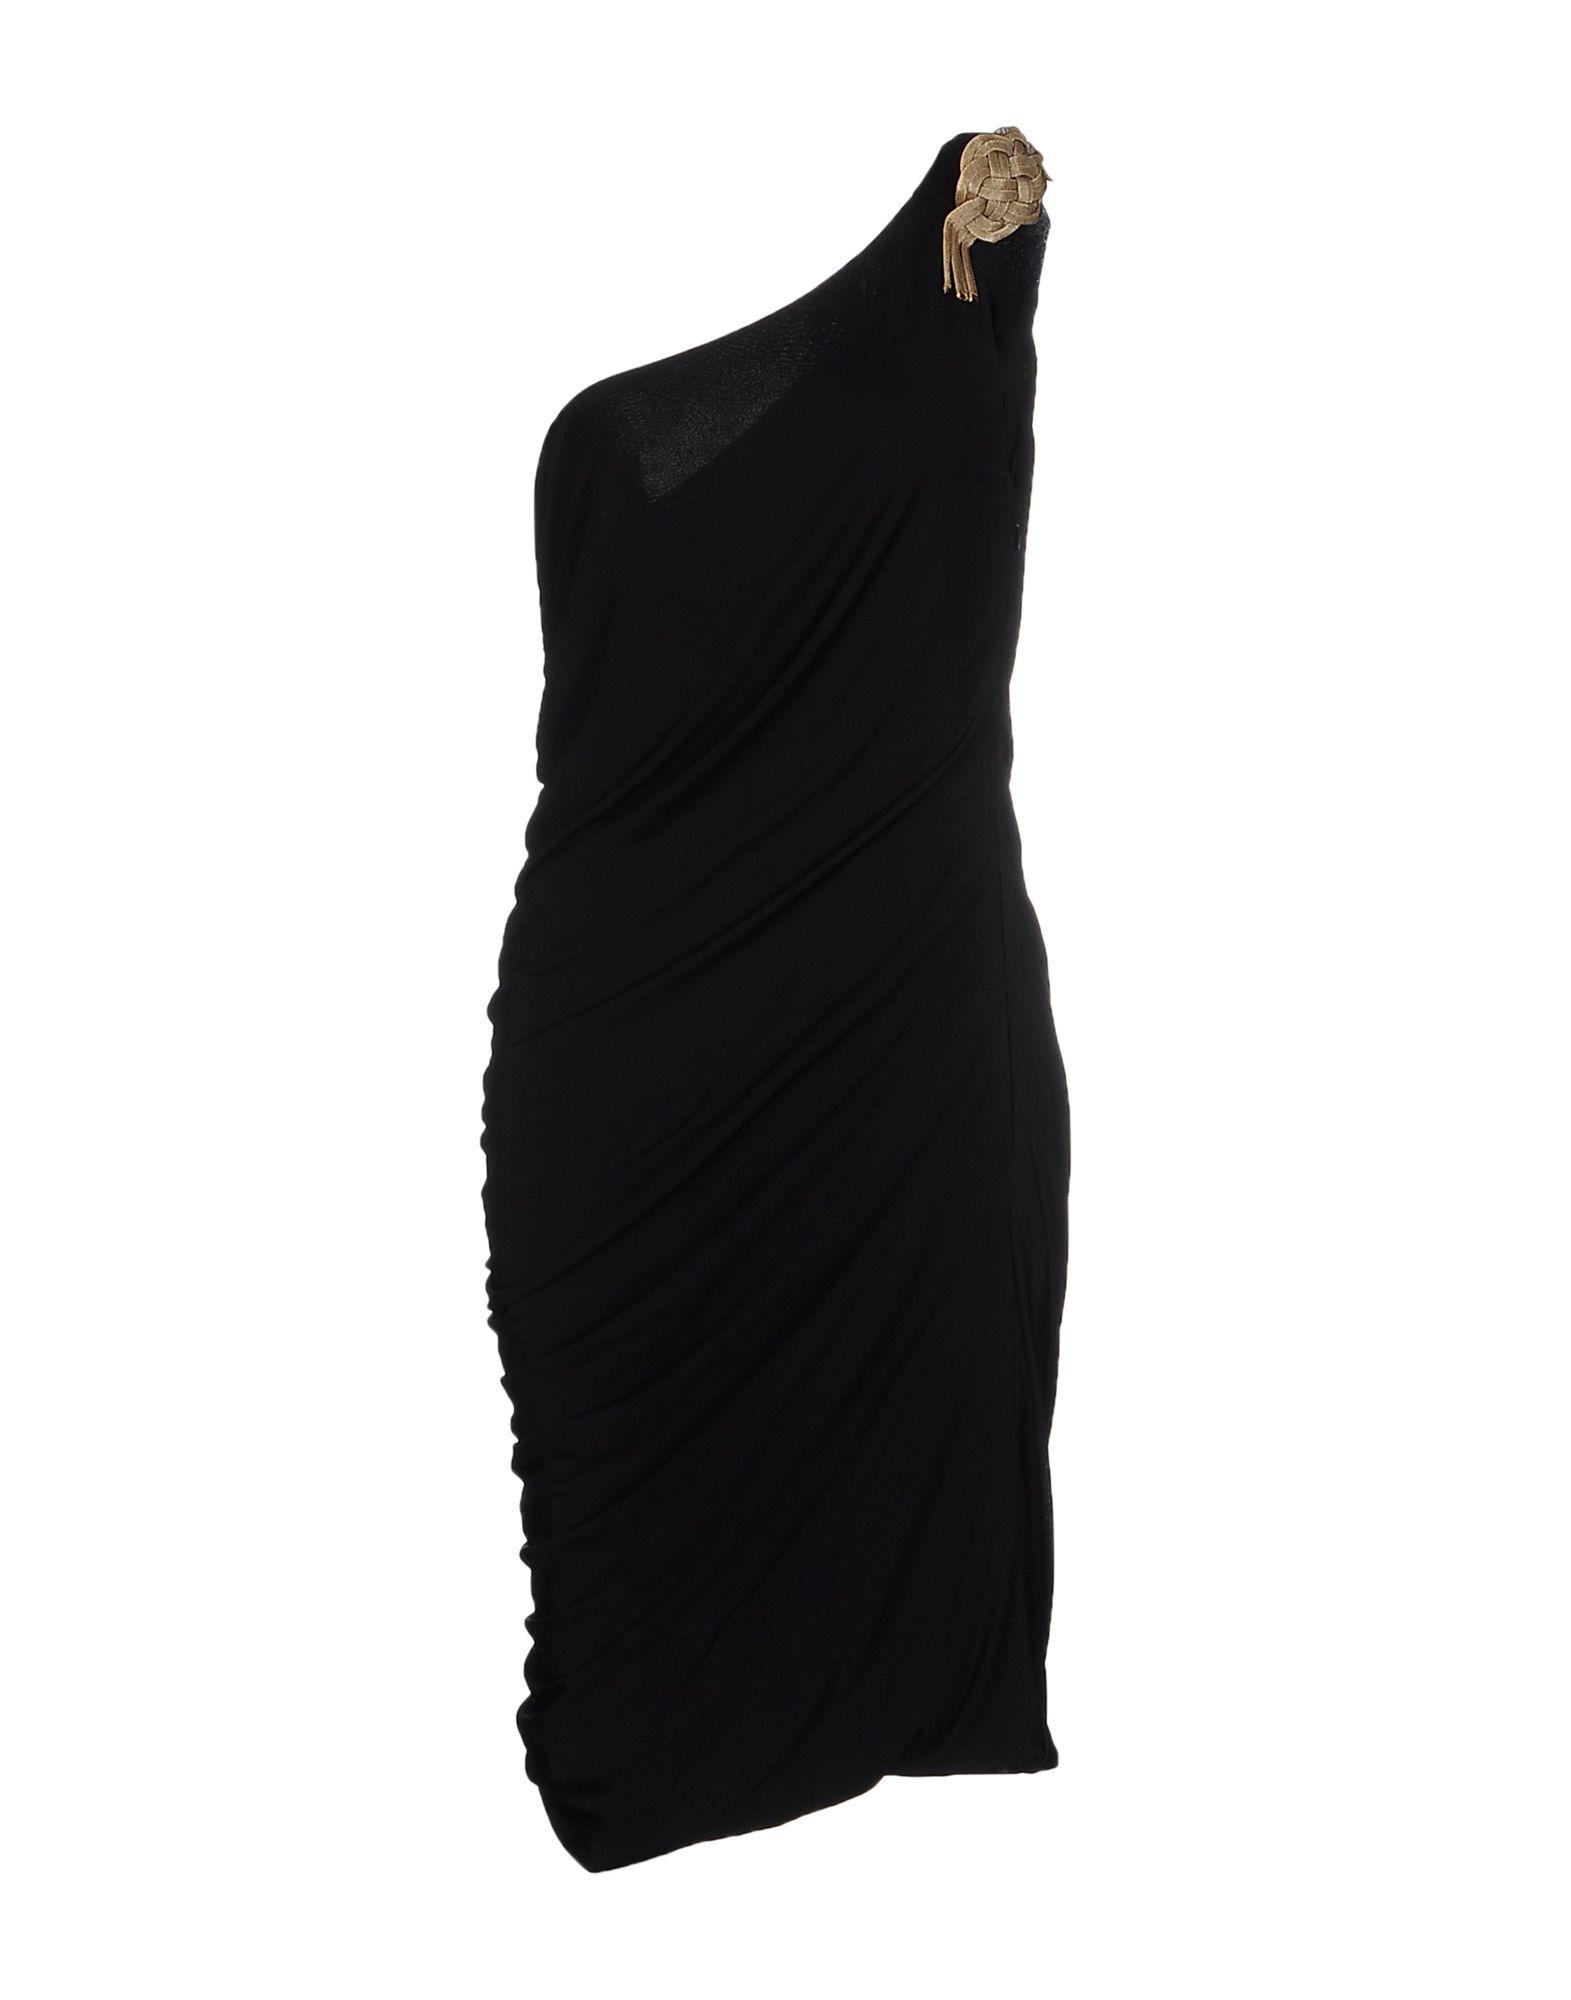 ROCCOBAROCCO Платье до колена roccobarocco платье roccobarocco 110404 синий